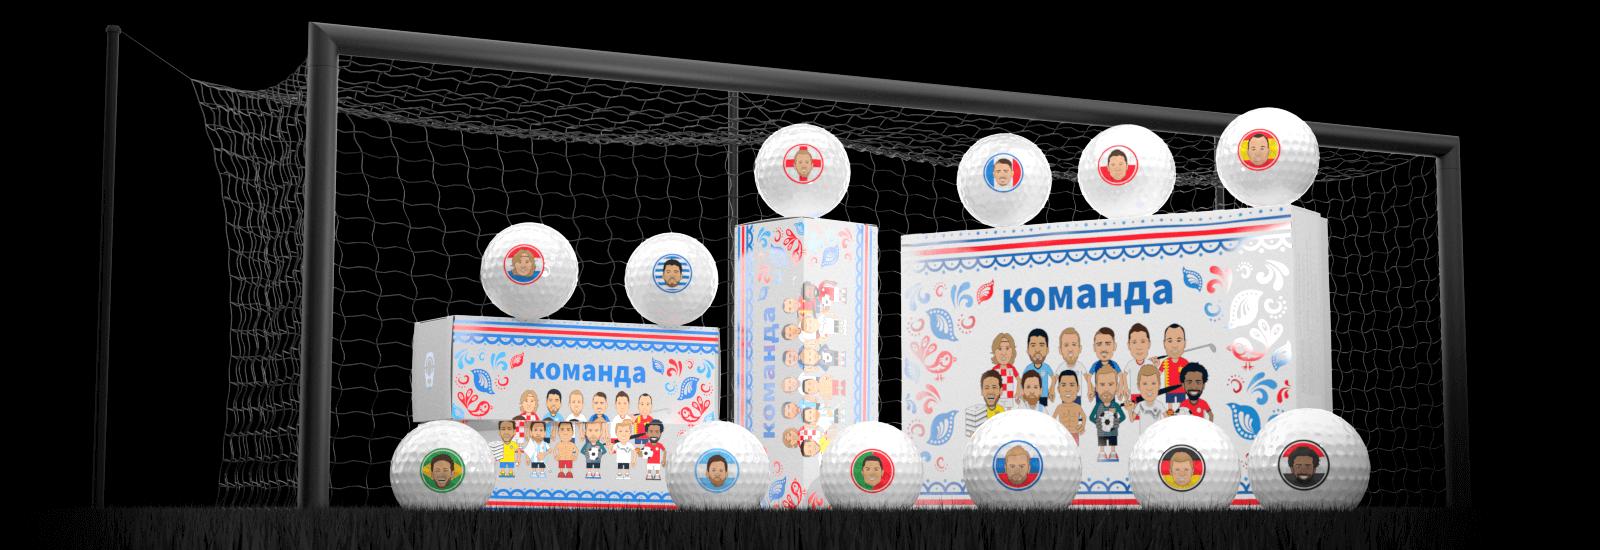 vicegolf_ball_pro_white_wm_komaha_international_slider01_desktop.png